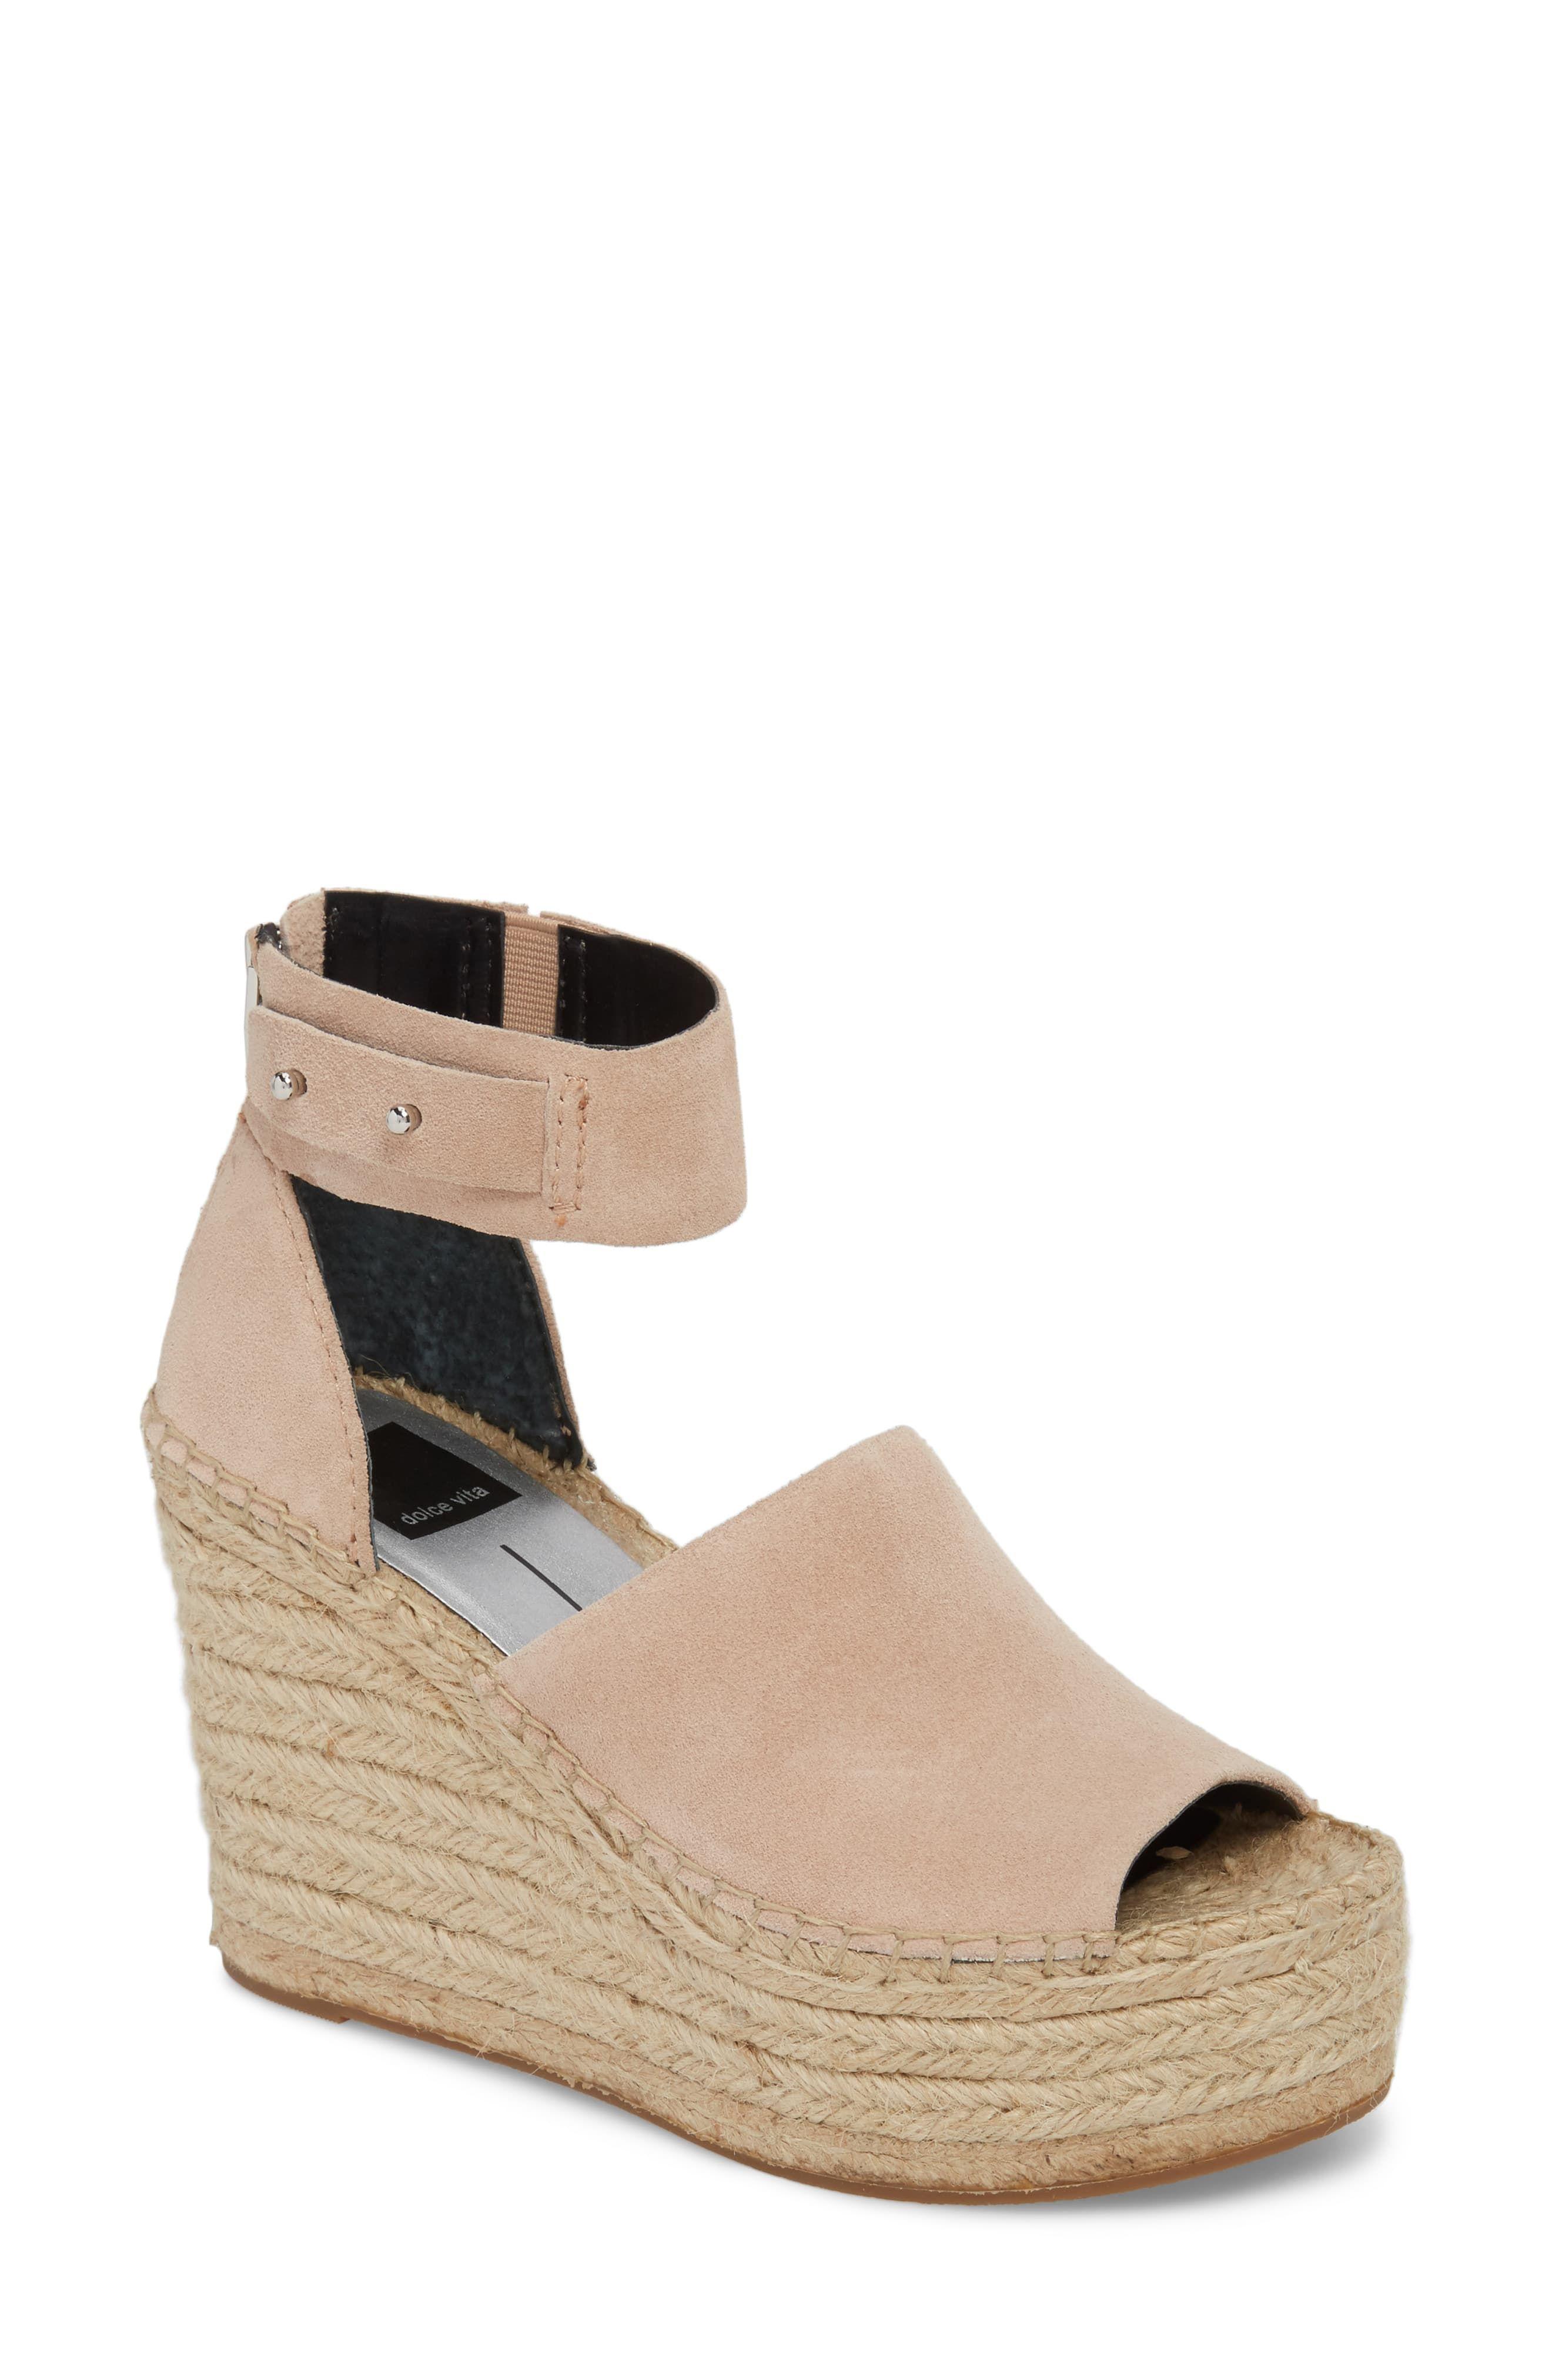 daa6ffaef0e Women's Dolce Vita Straw Wedge Espadrille Sandal, Size 8.5 M - Pink ...